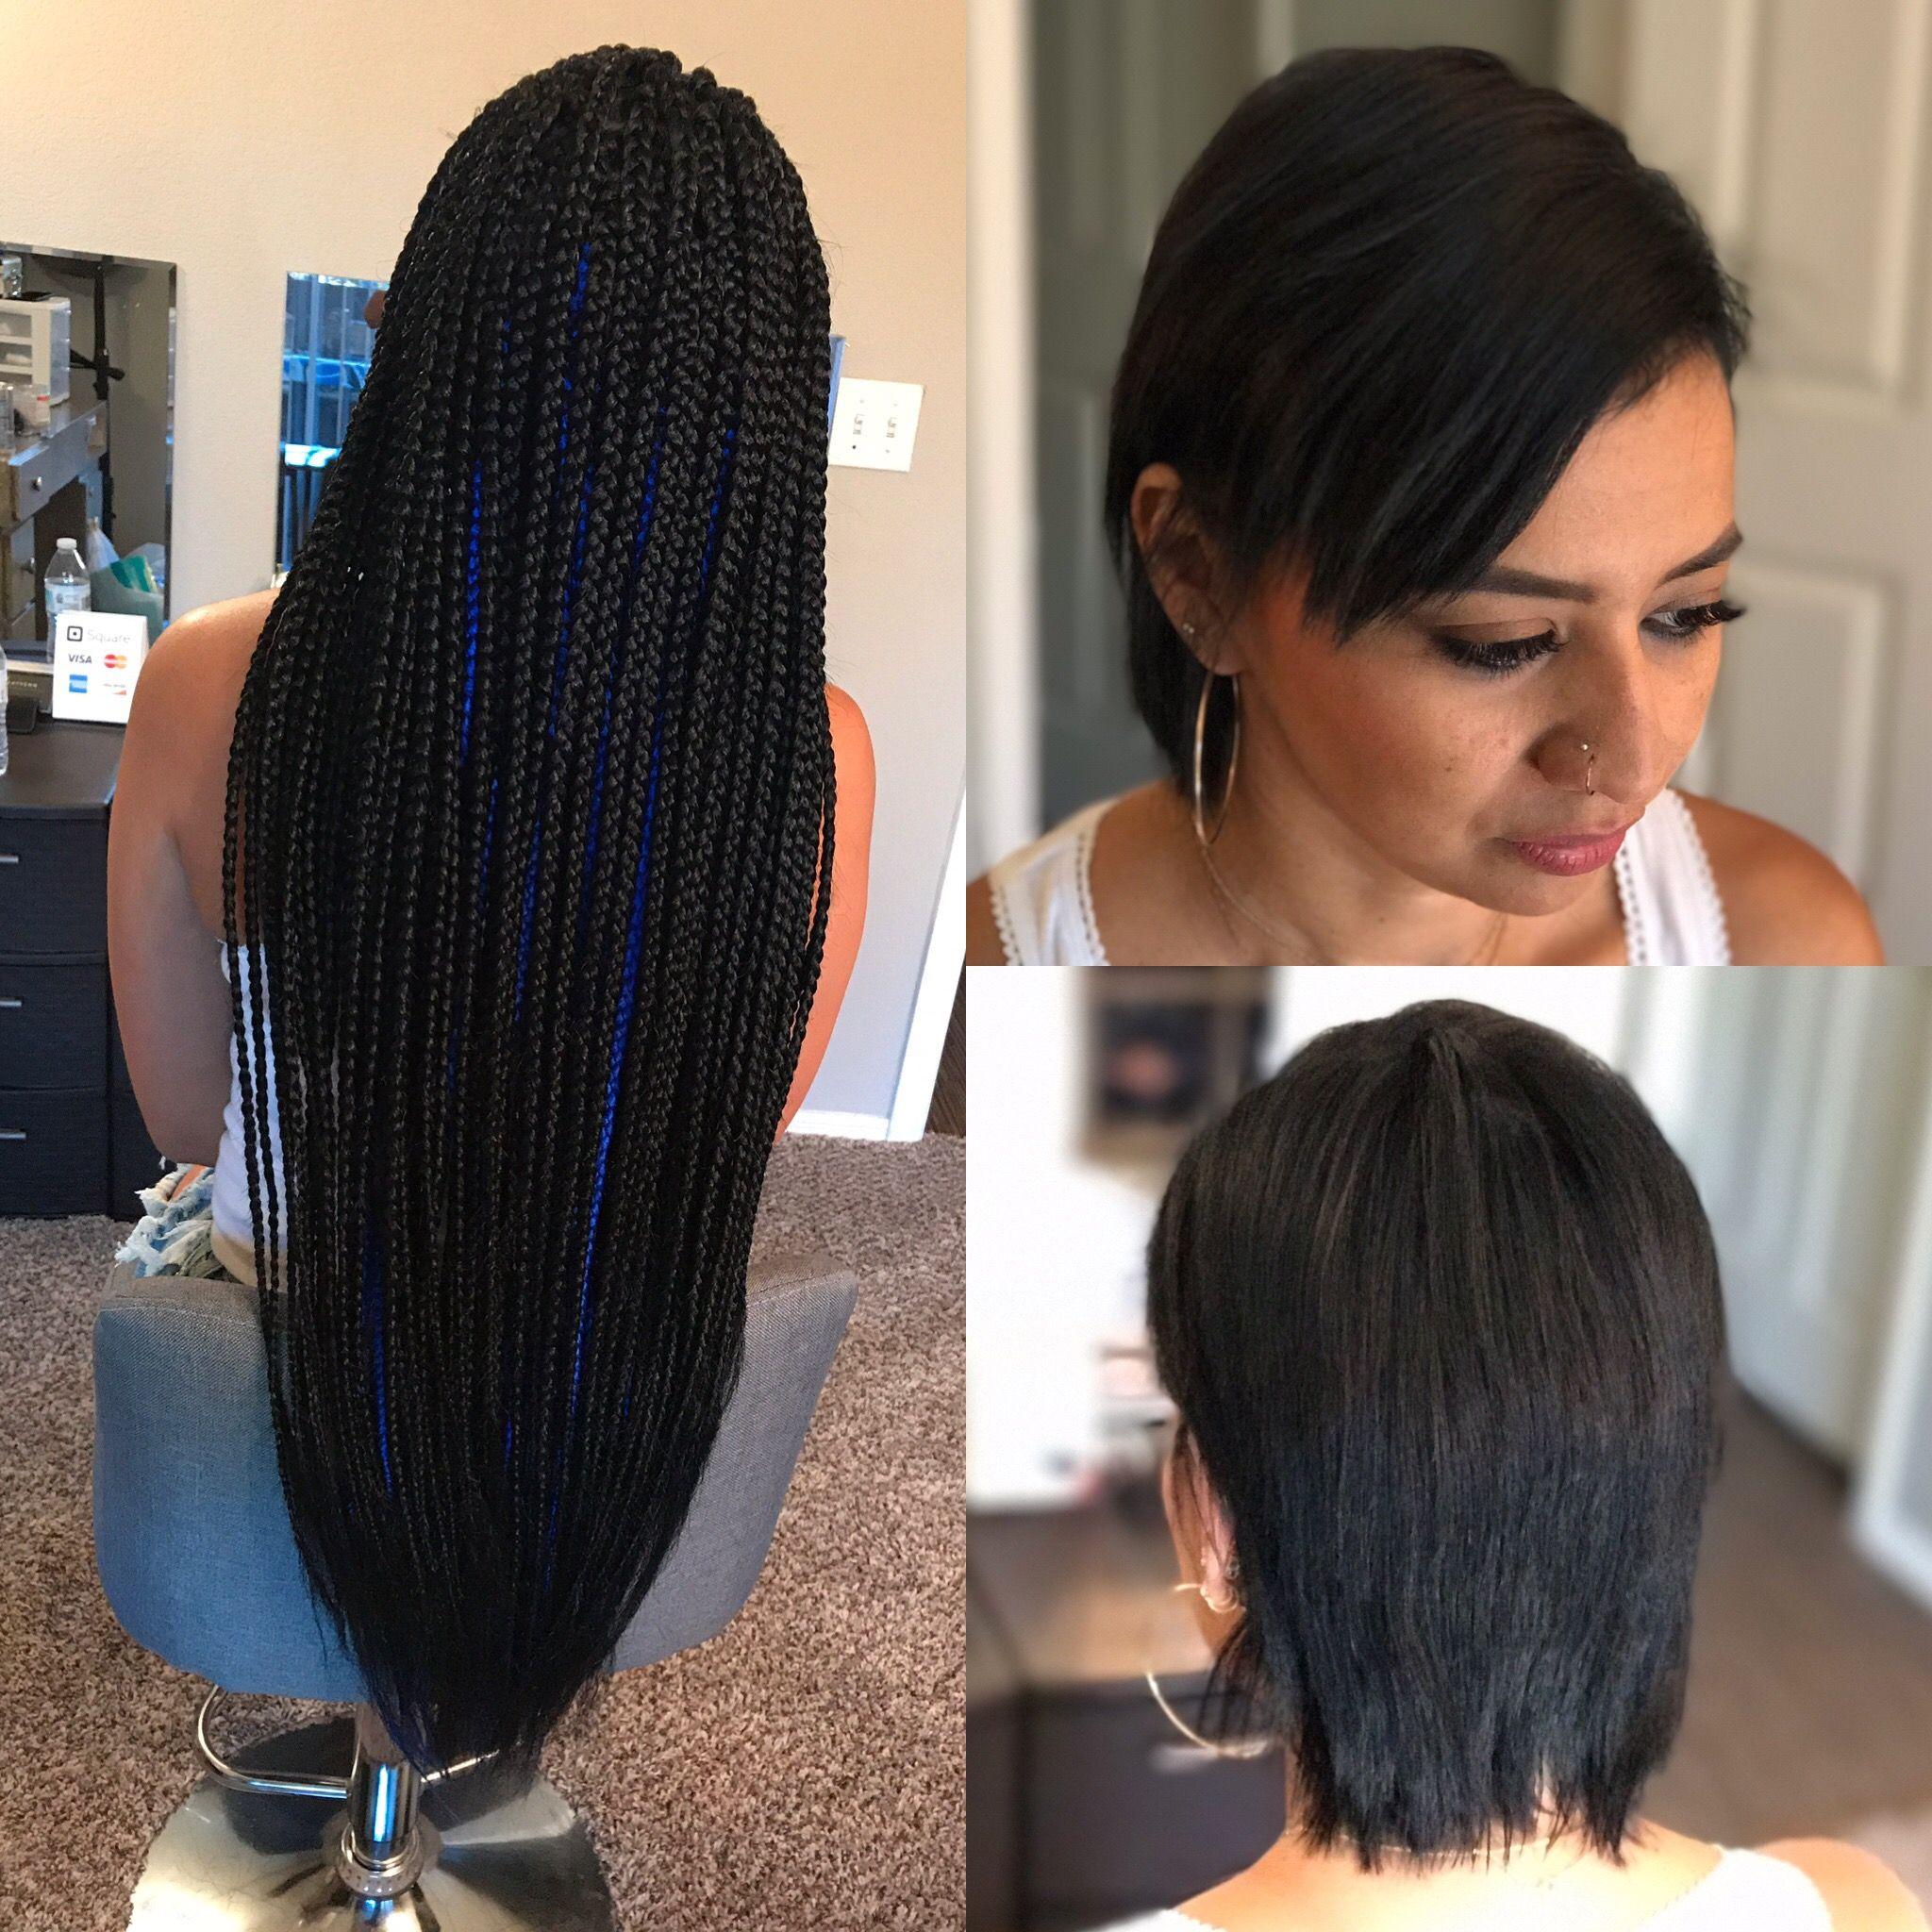 Phoenix Tempe Hairstylist Book Online Www Marmarzdivinestylez Com 520 371 3100 5151 E Guadalupe Rd Phoenix Az 85044 Hair Stylist Hair Styles Hair